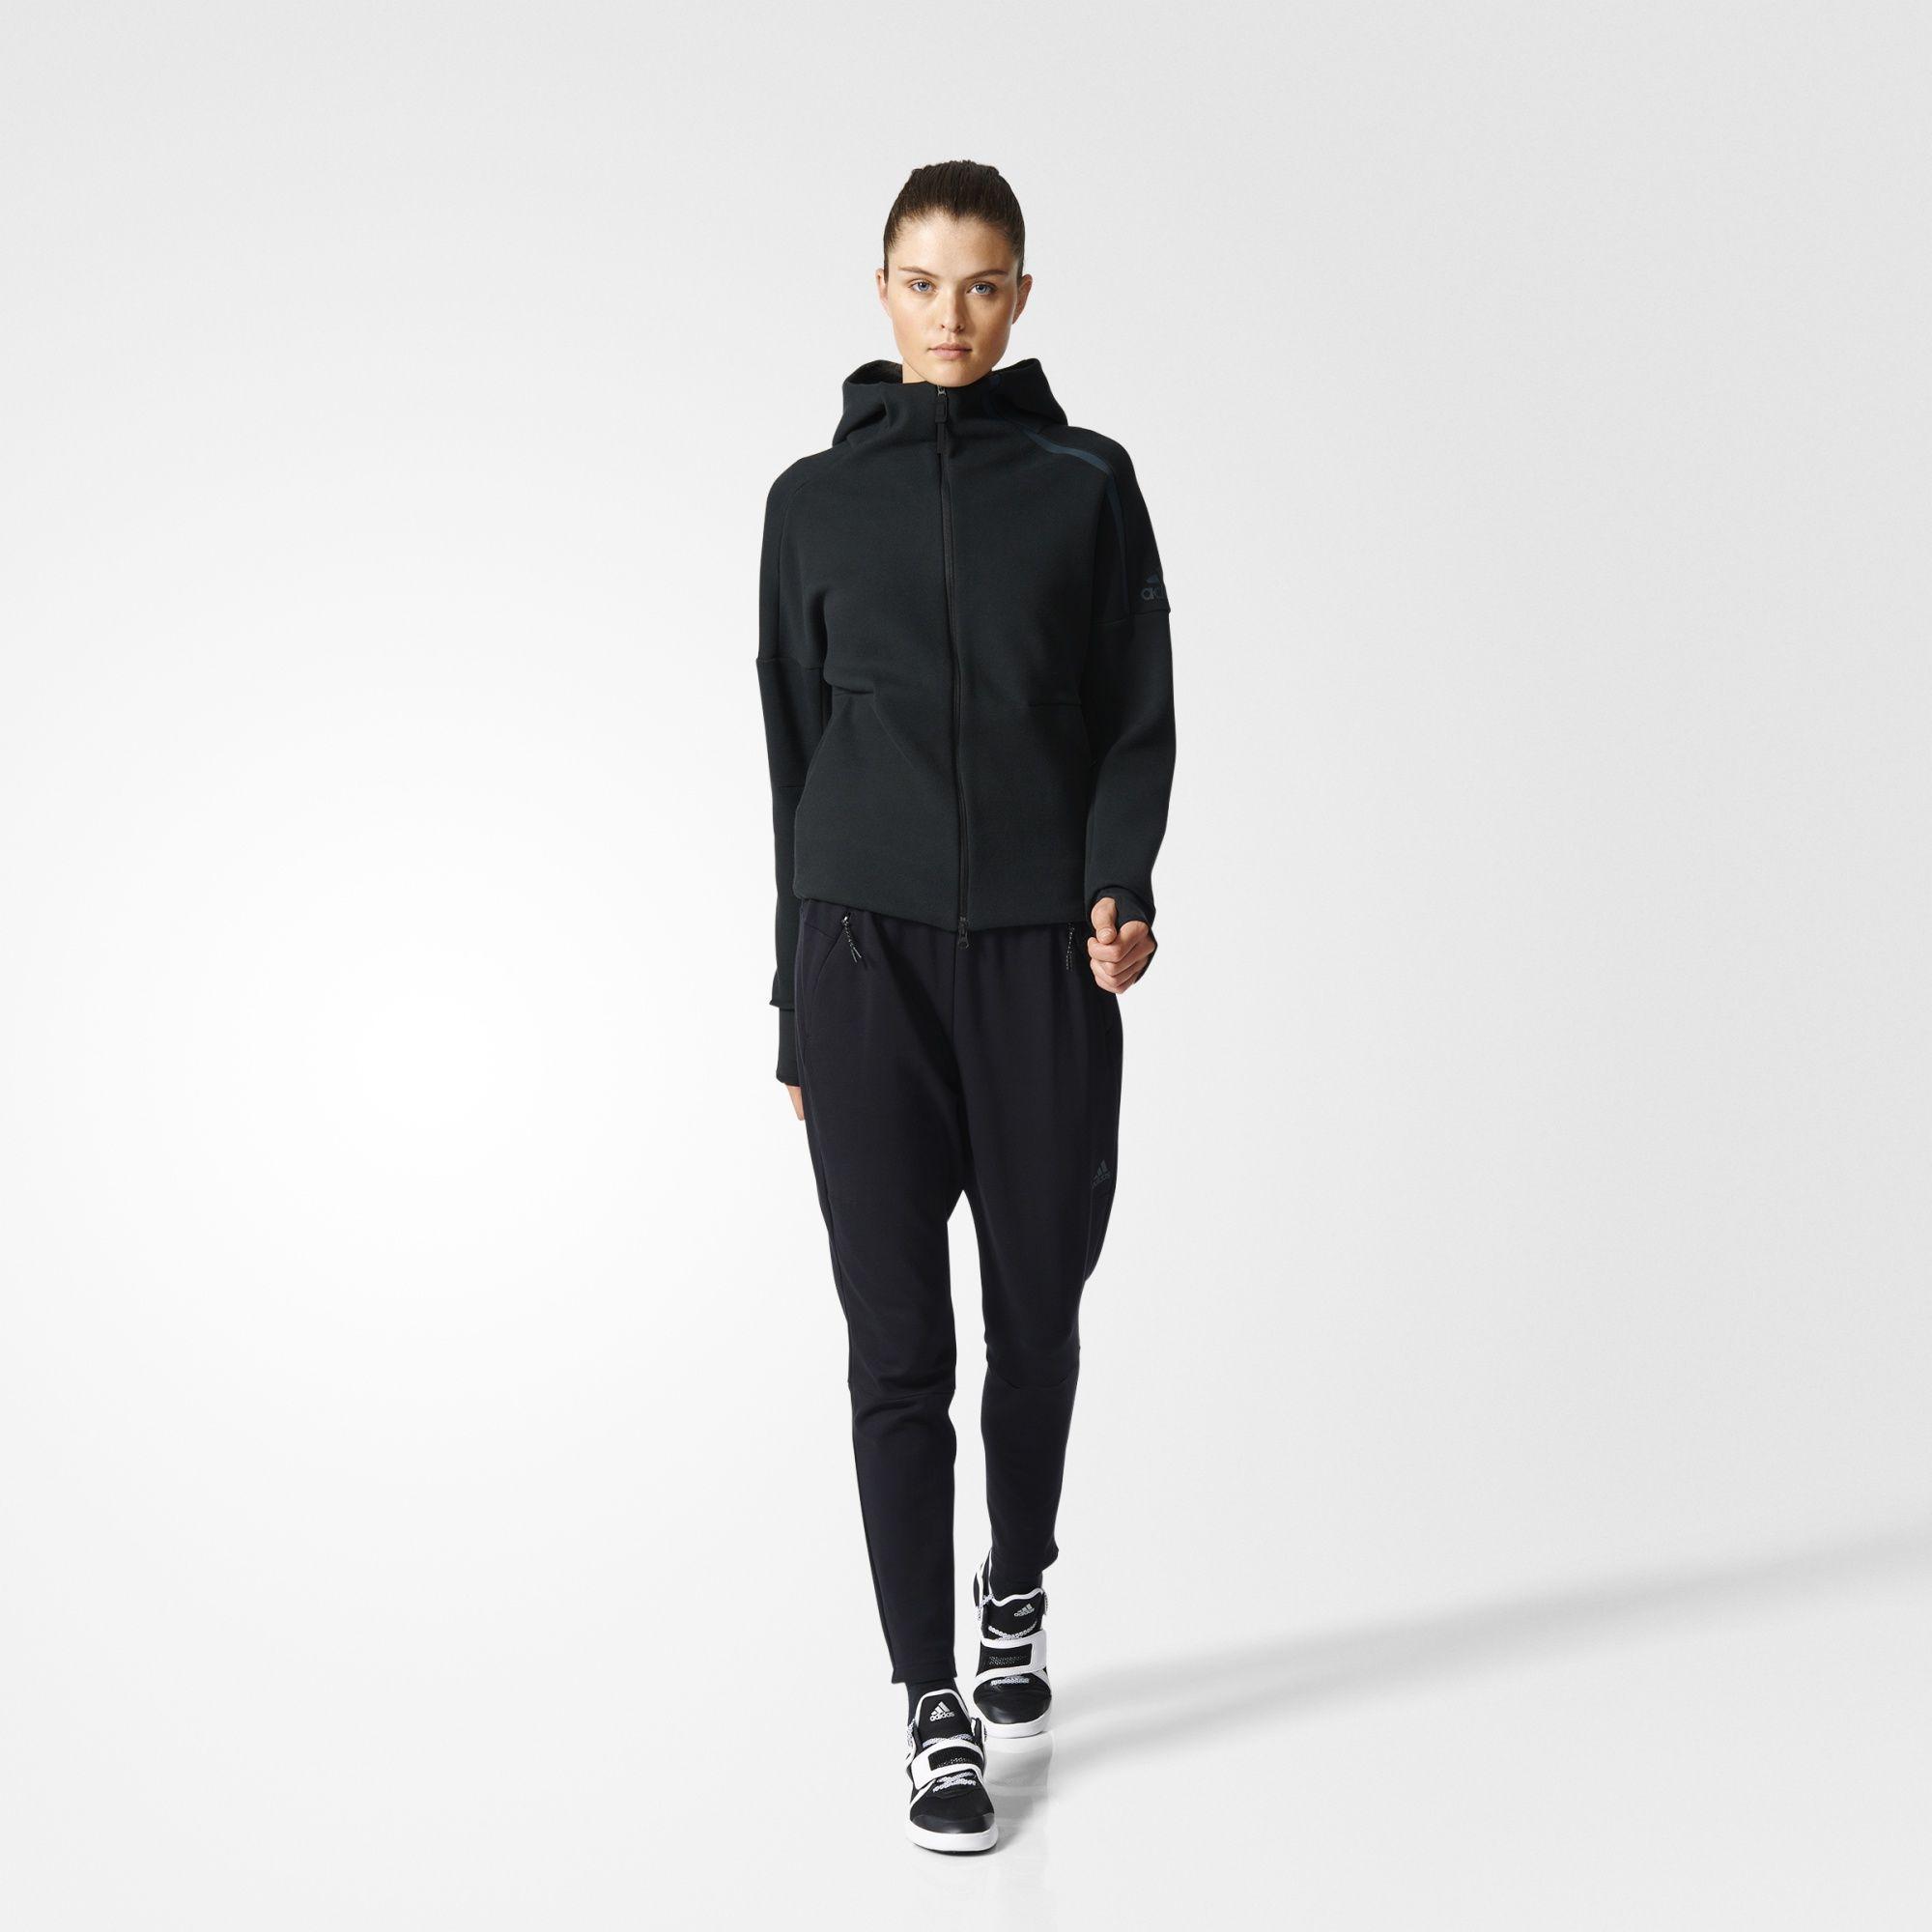 adidas Z.N.E. Pants | Pants for women, Athletic sweatpants